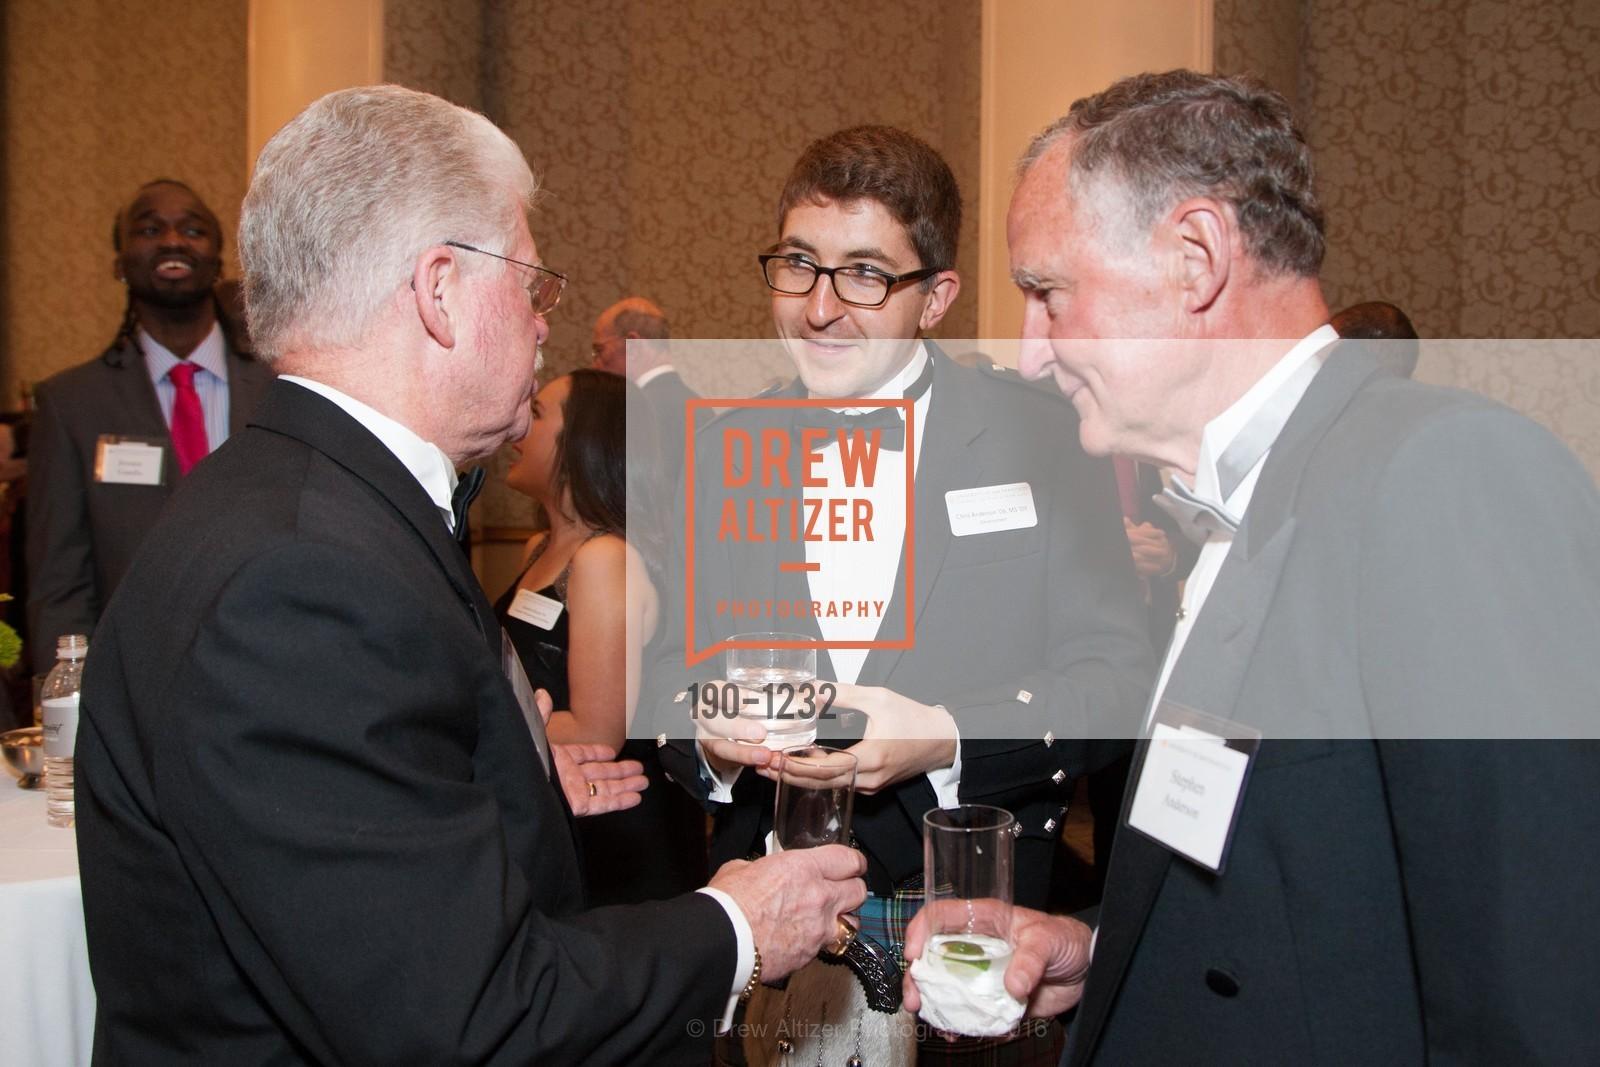 John Cahill, Chris Anderson, Stephen Anderson, Photo #190-1232